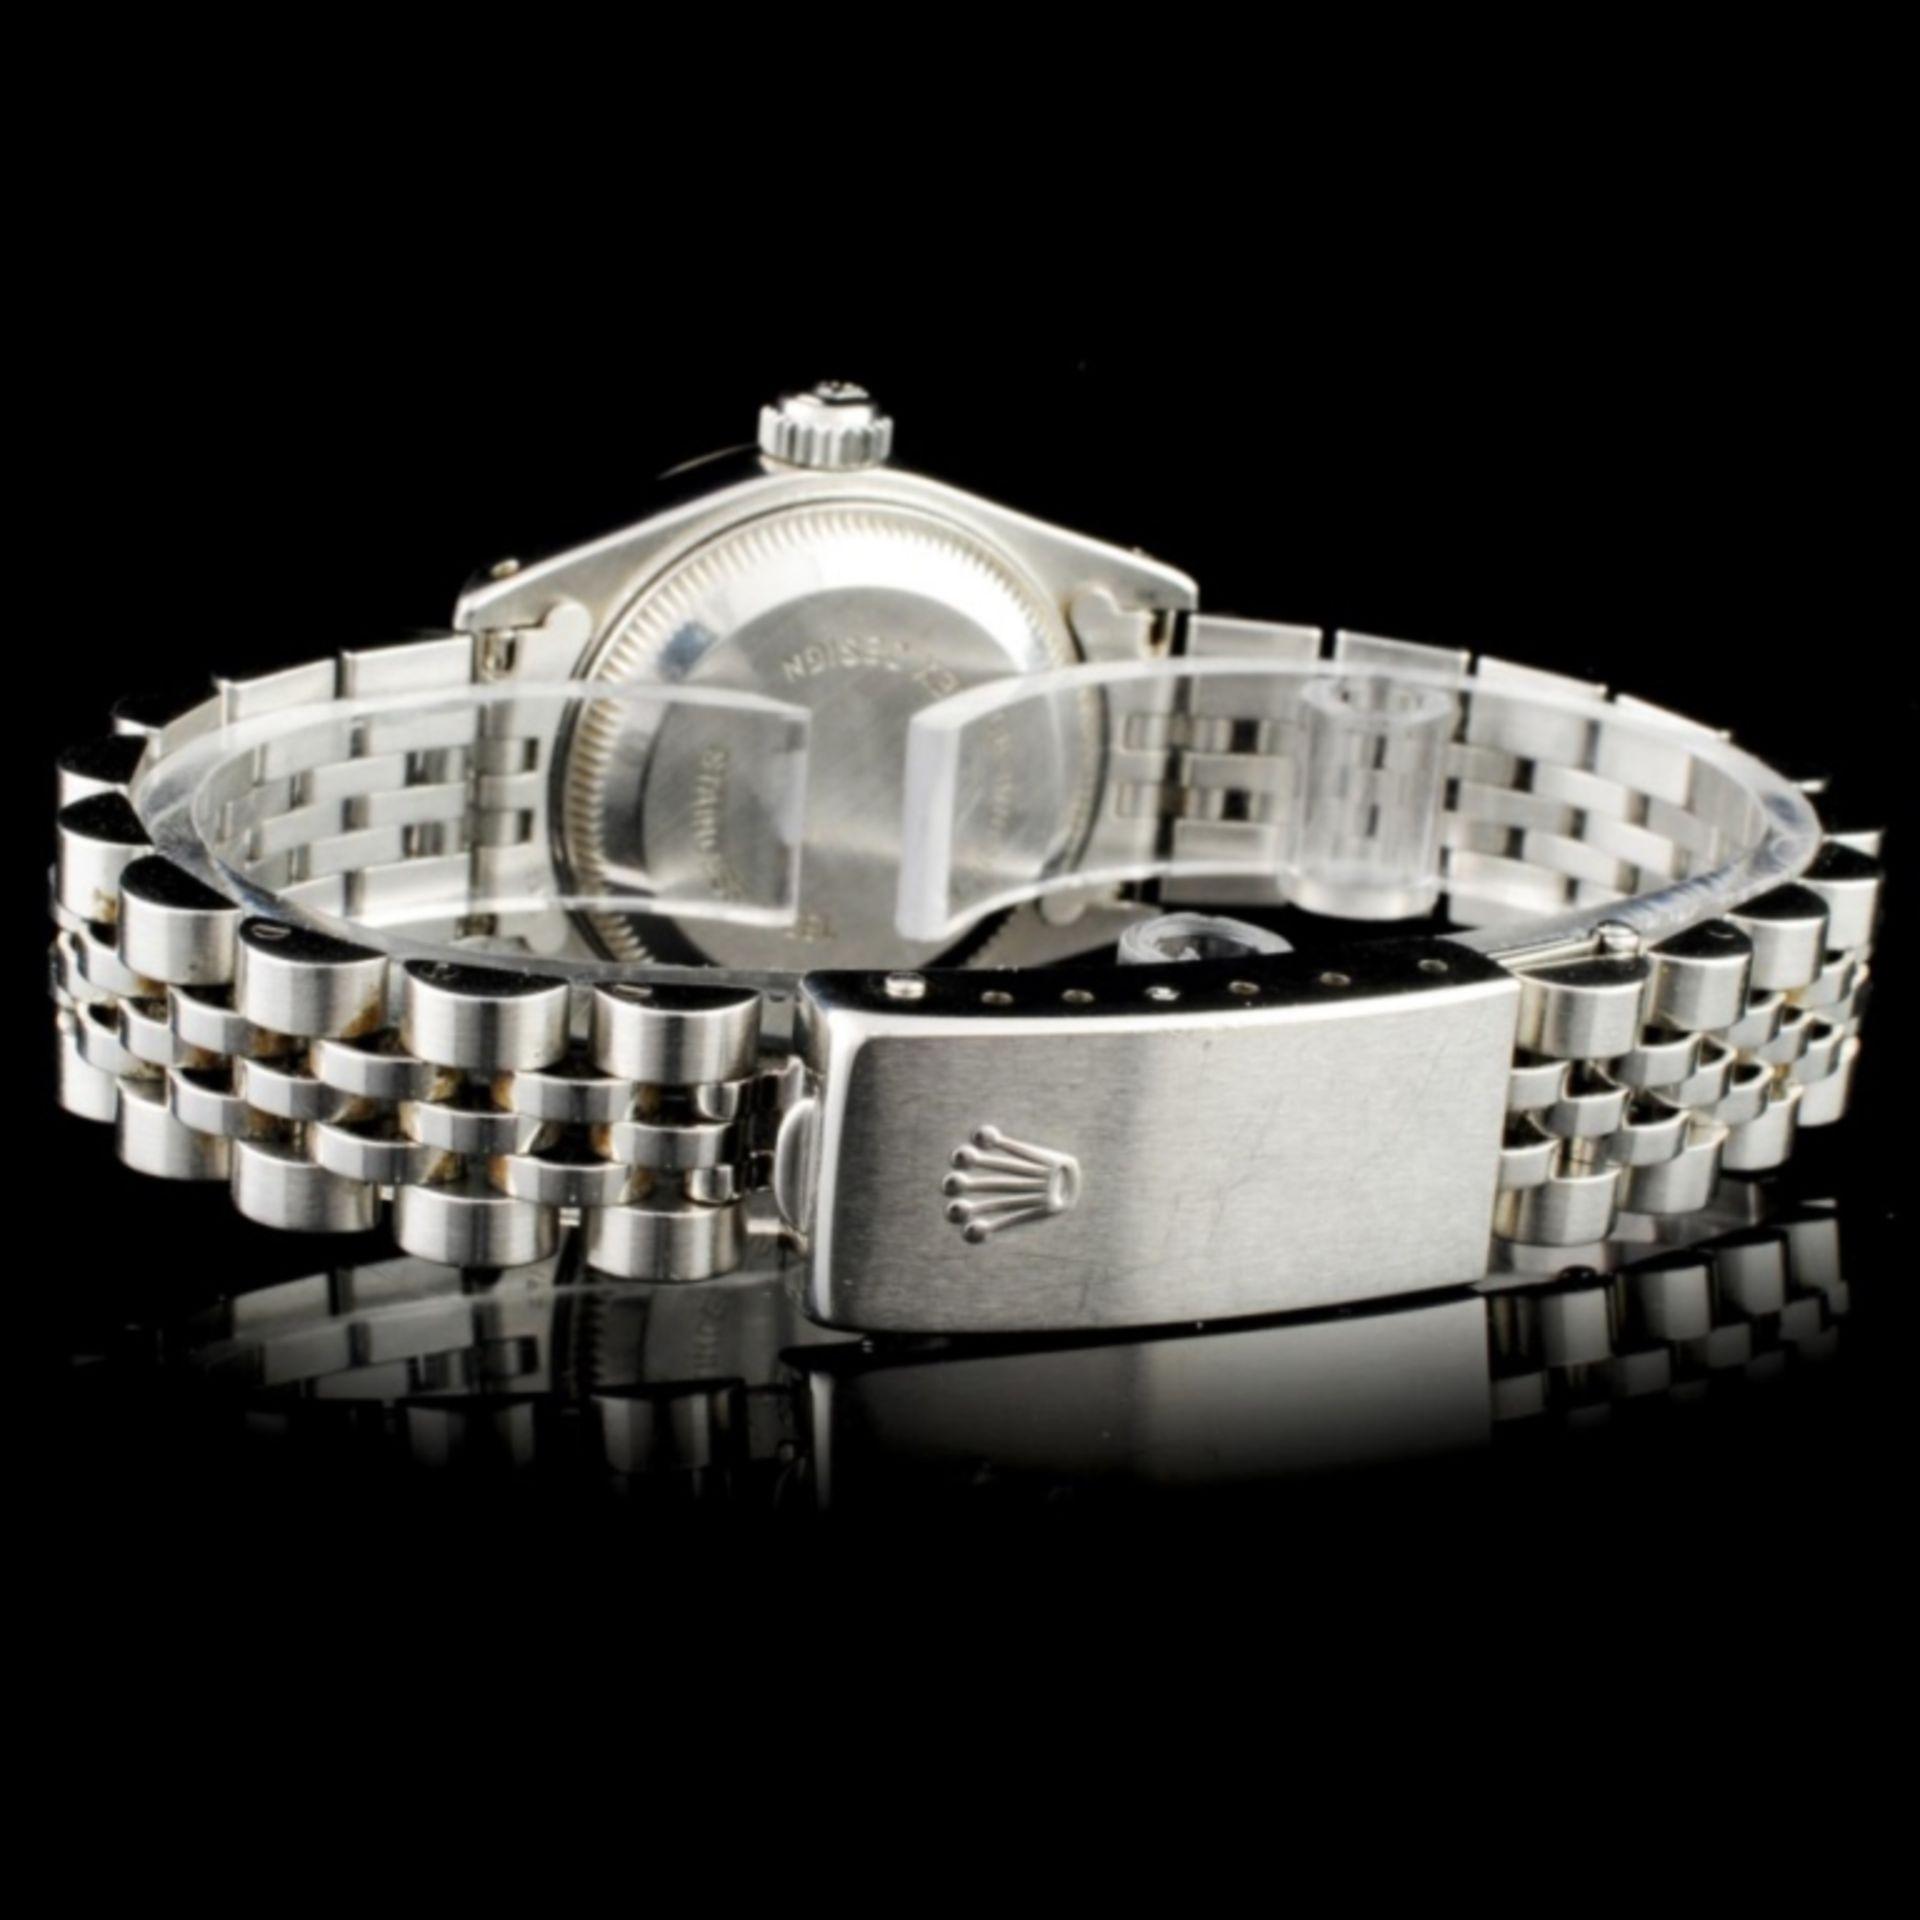 Rolex DateJust 18K & SS Ladies Wristwatch - Image 4 of 6